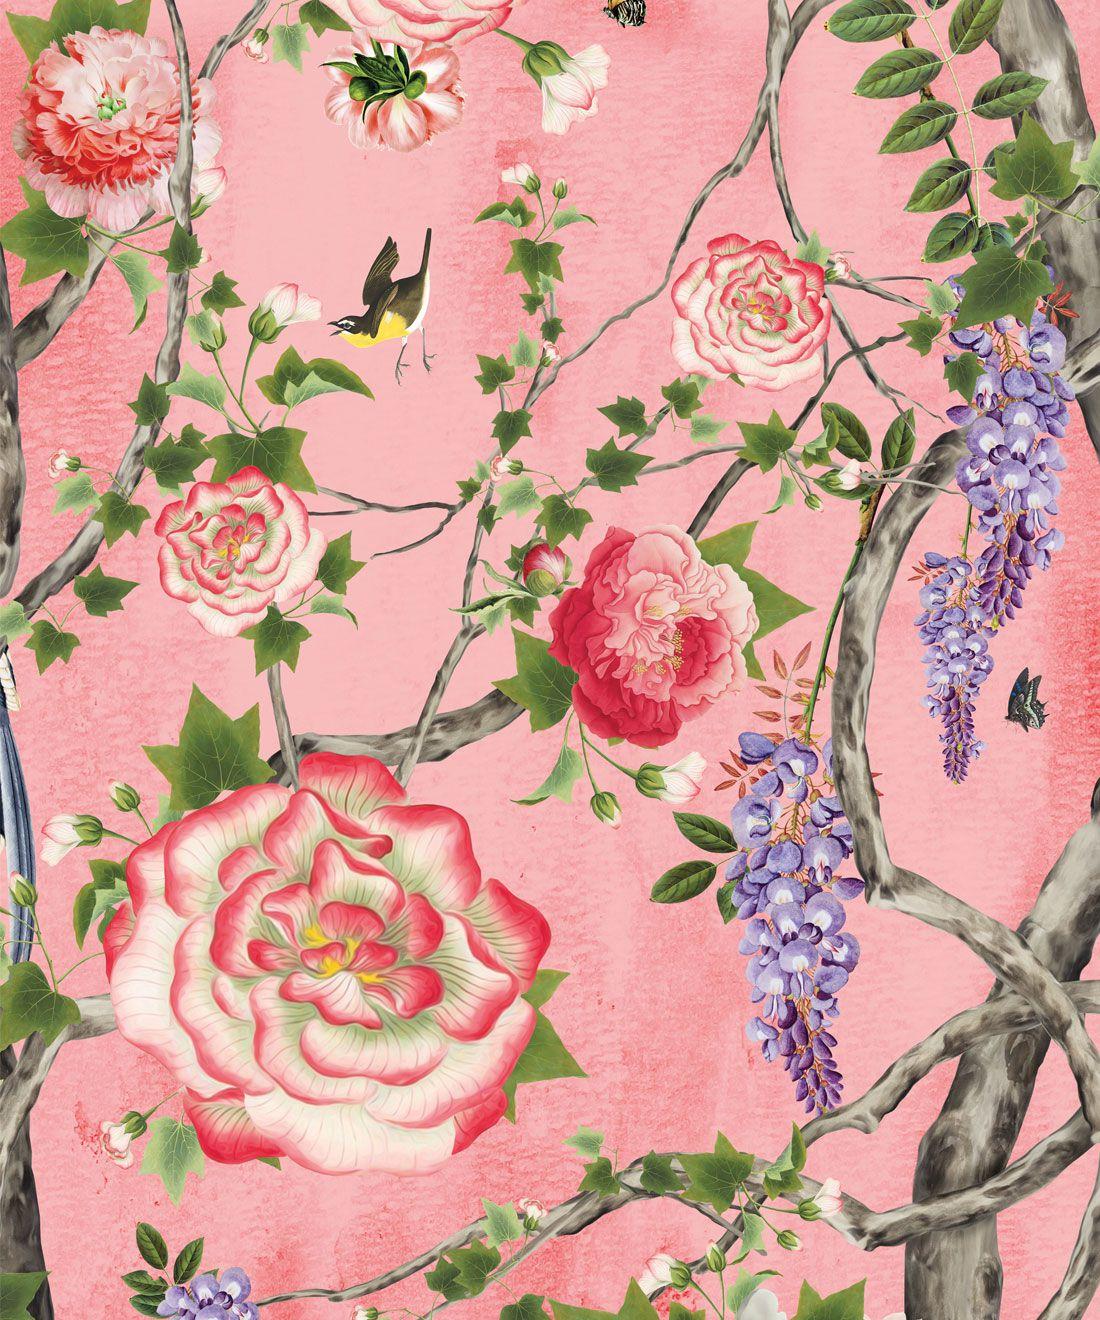 Empress Wallpaper • Romantic Wallpaper • Floral Wallpaper • Chinoiserie Wallpaper • Coral colour wallpaper swatch